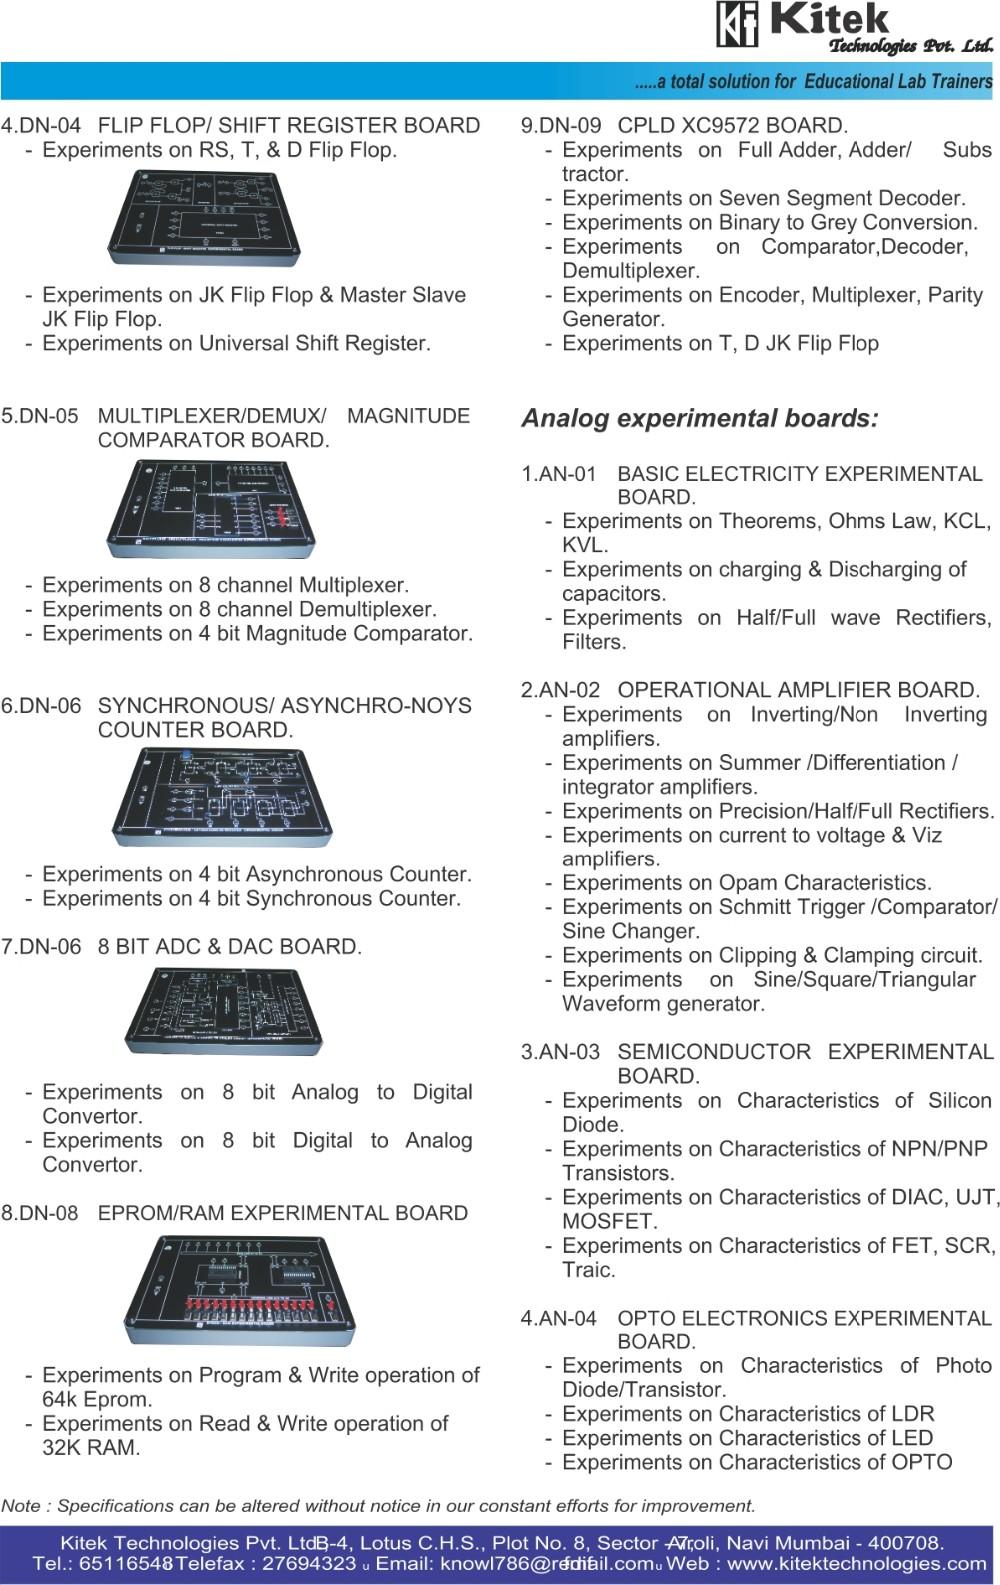 Electronics Lab Trainer Kit Vocational Training Digital 5v To 12v Inverting Switching Regulator Electronicslab Kms 01 Pag 2